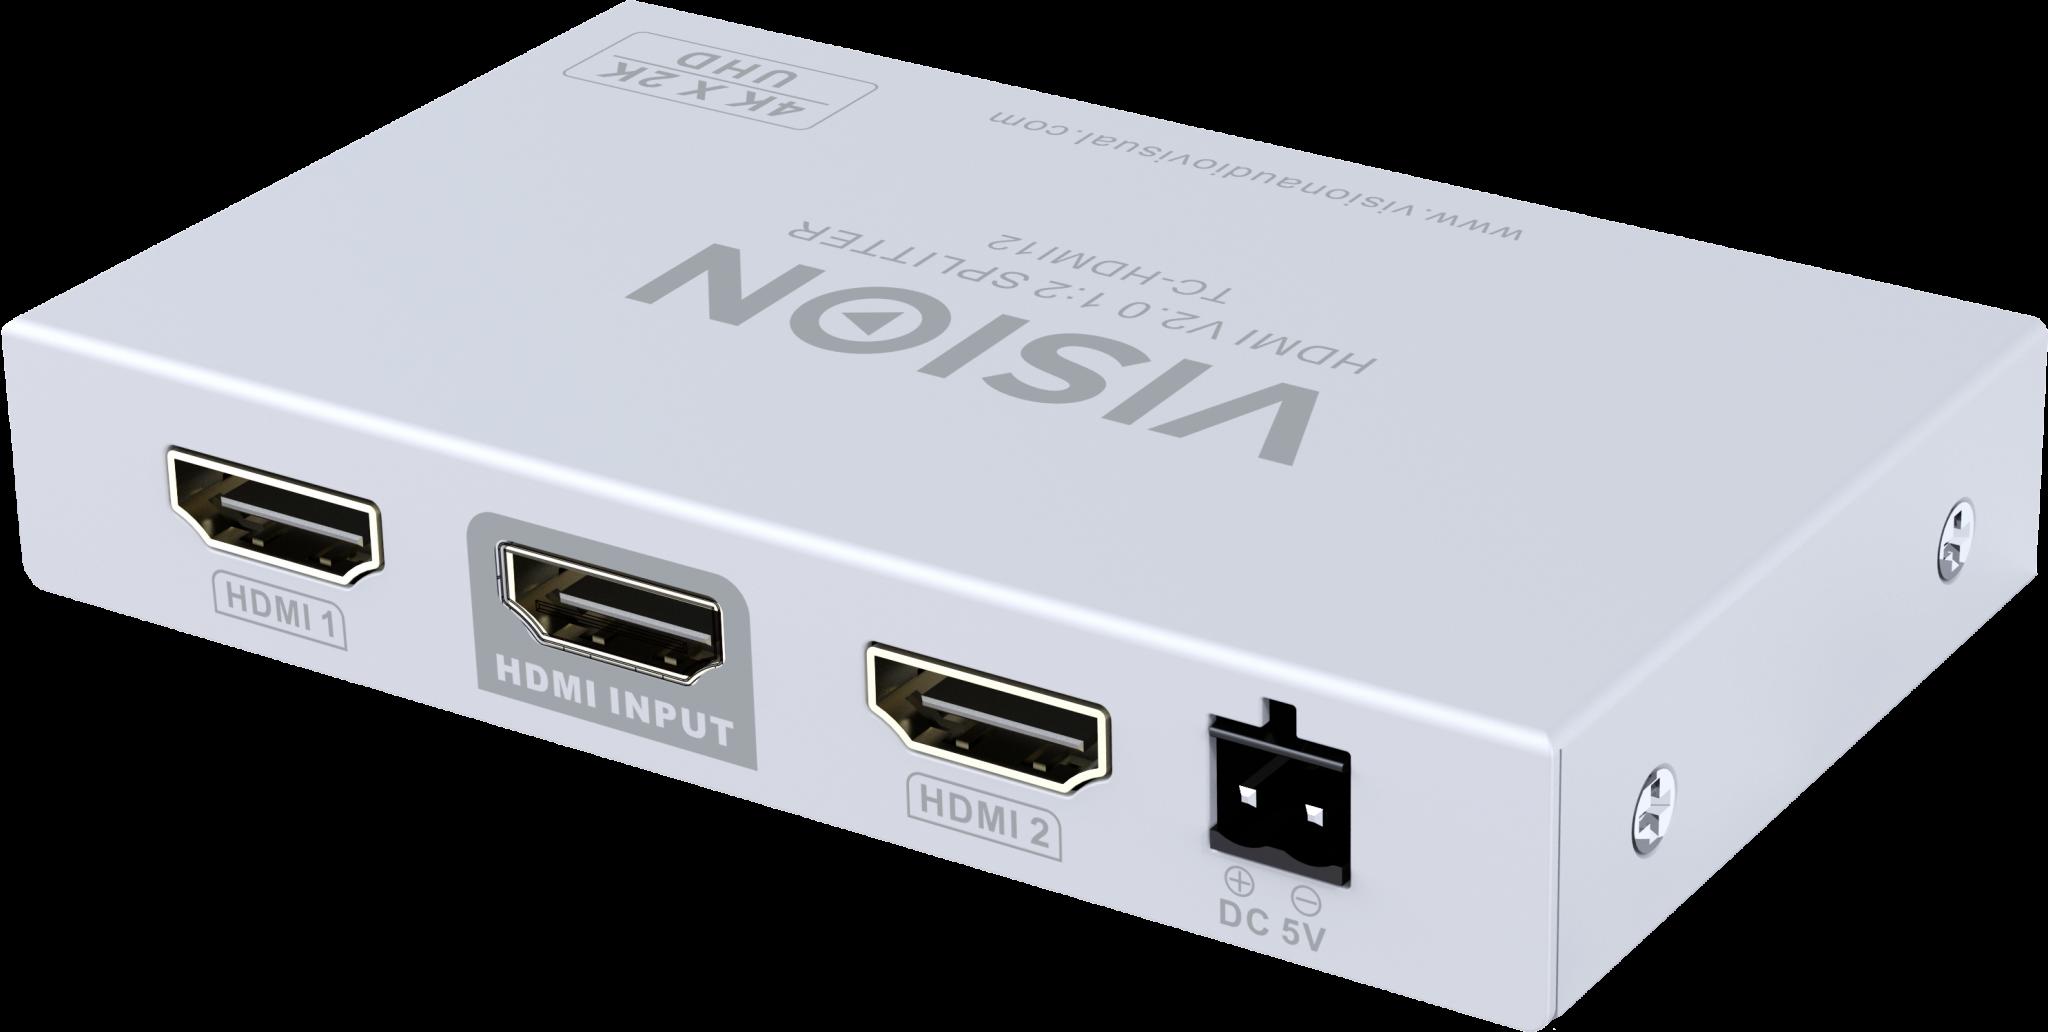 TC-HDMI12 HDMI Splitter | Vision Audio Visual